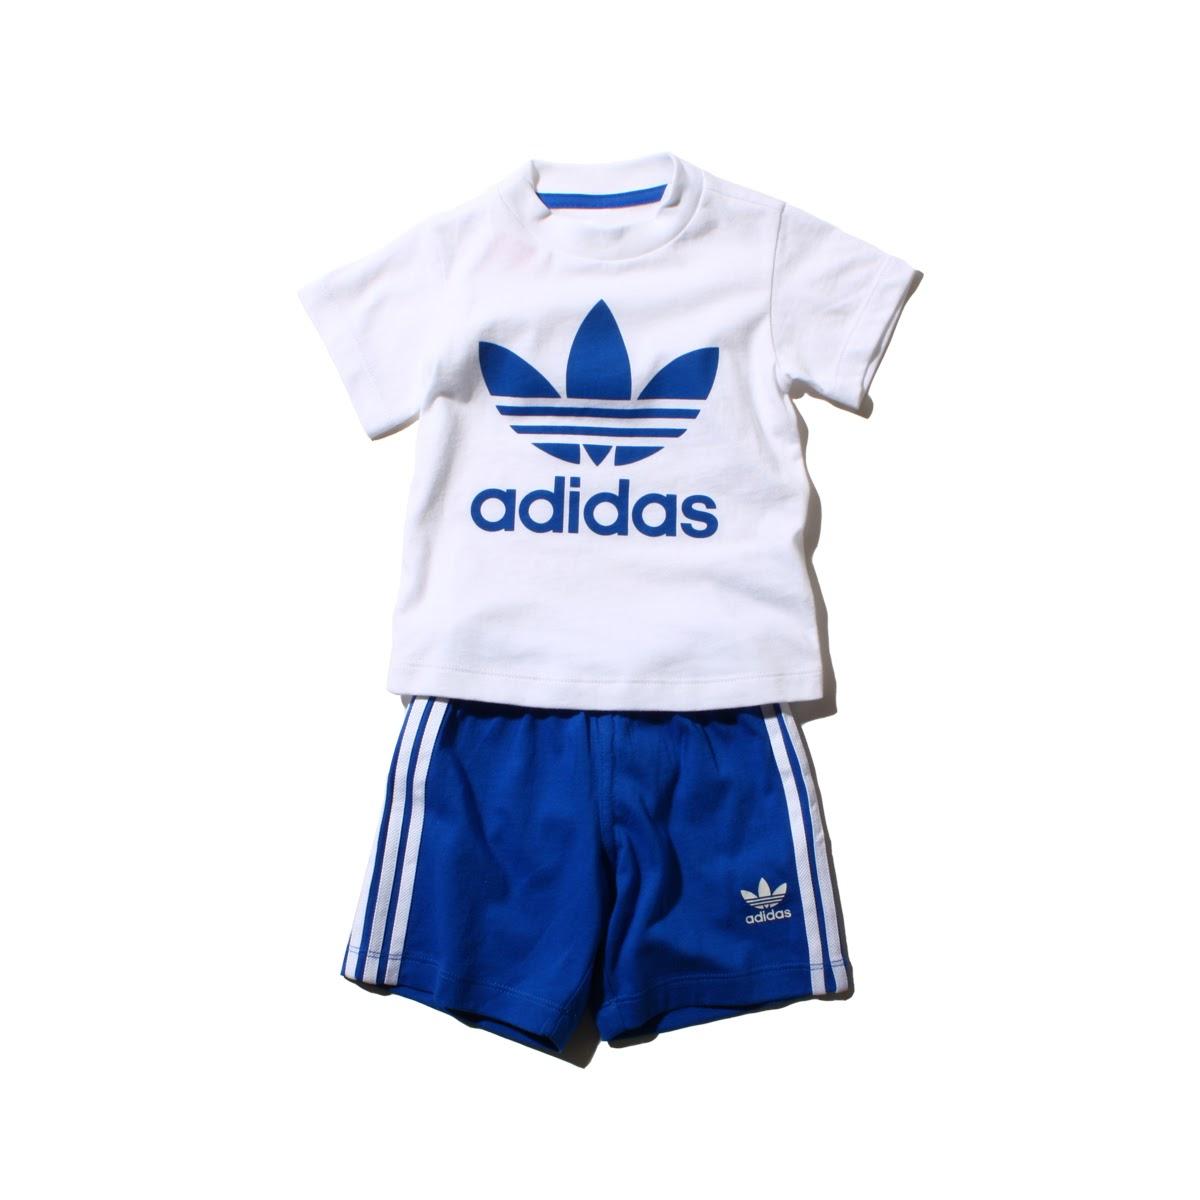 adidas Originals INFANT SHORT TEE SETアディダス オリジナルス インファント ショートwOy80vPmNn